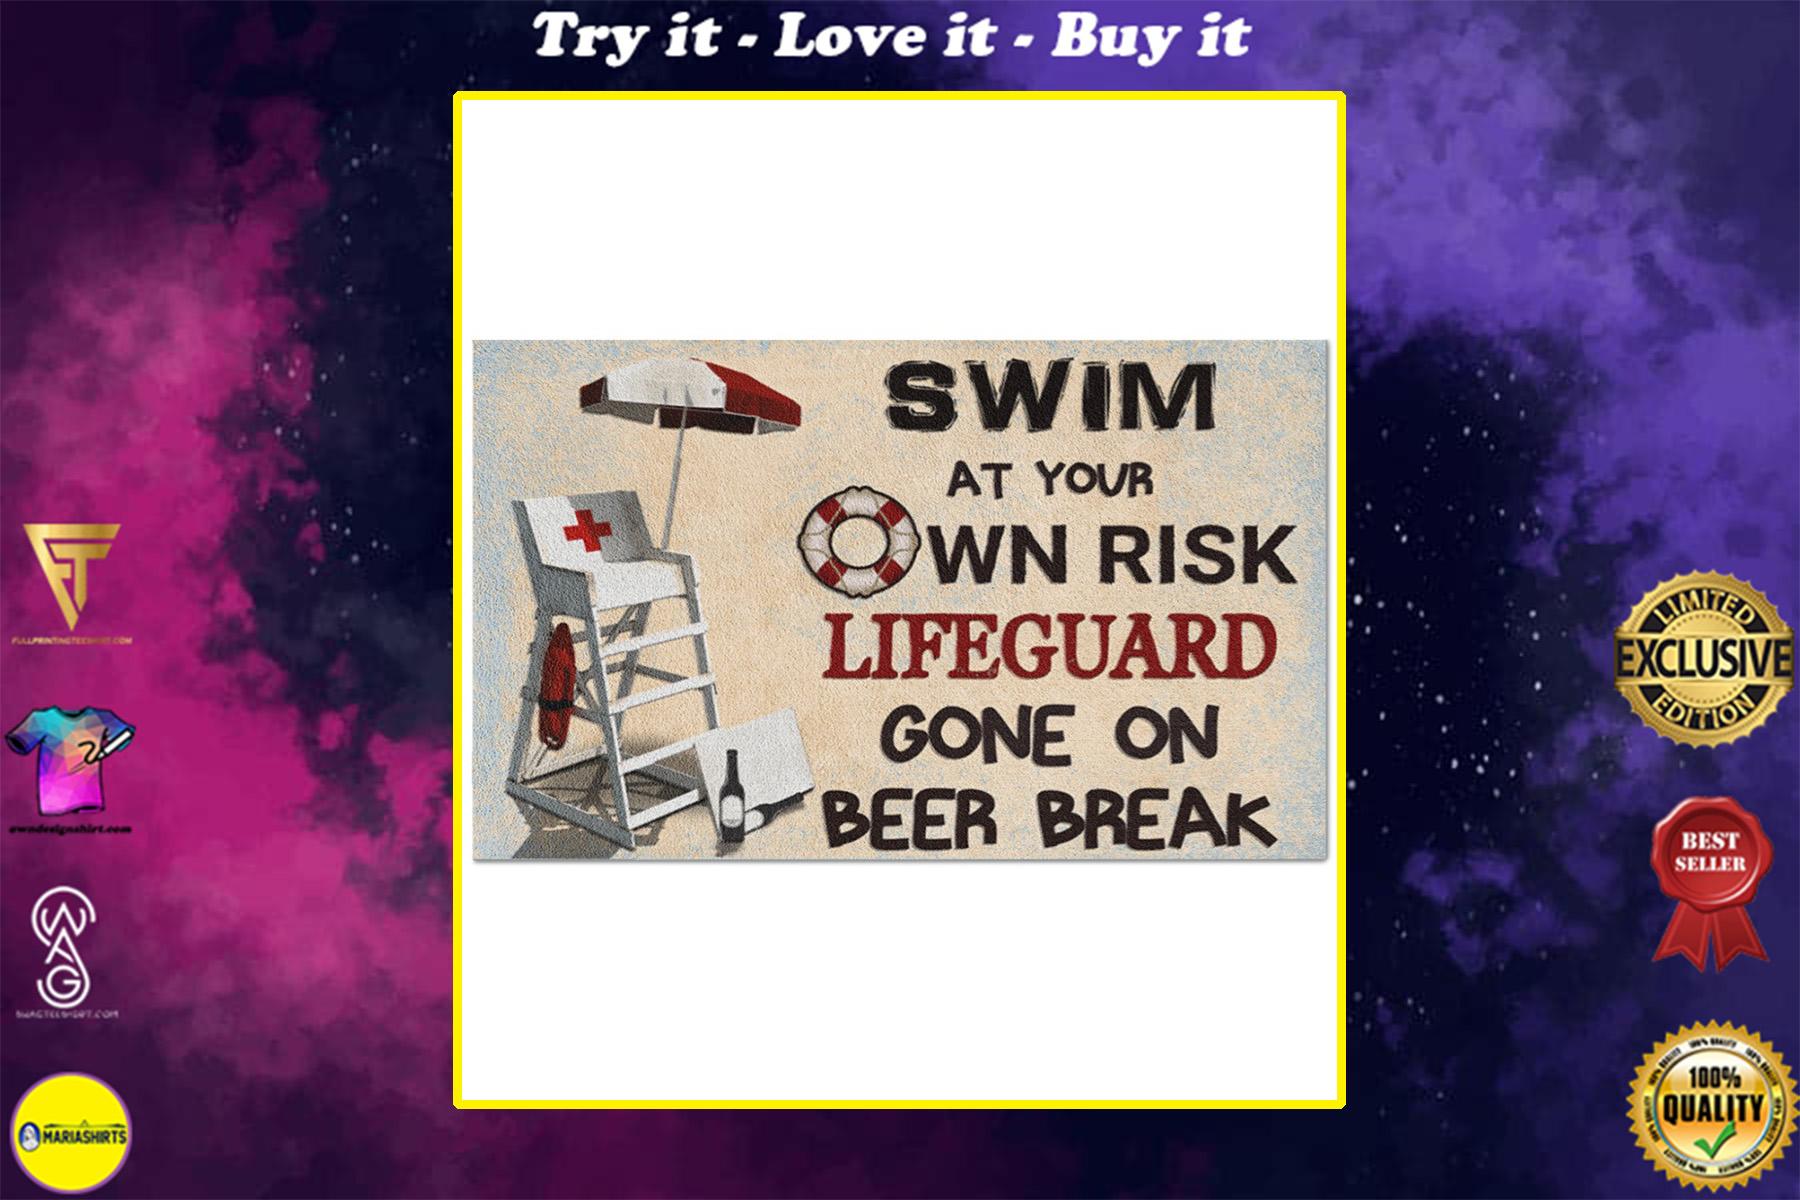 swim at your own risk lifeguard gone on beer break full printing doormat